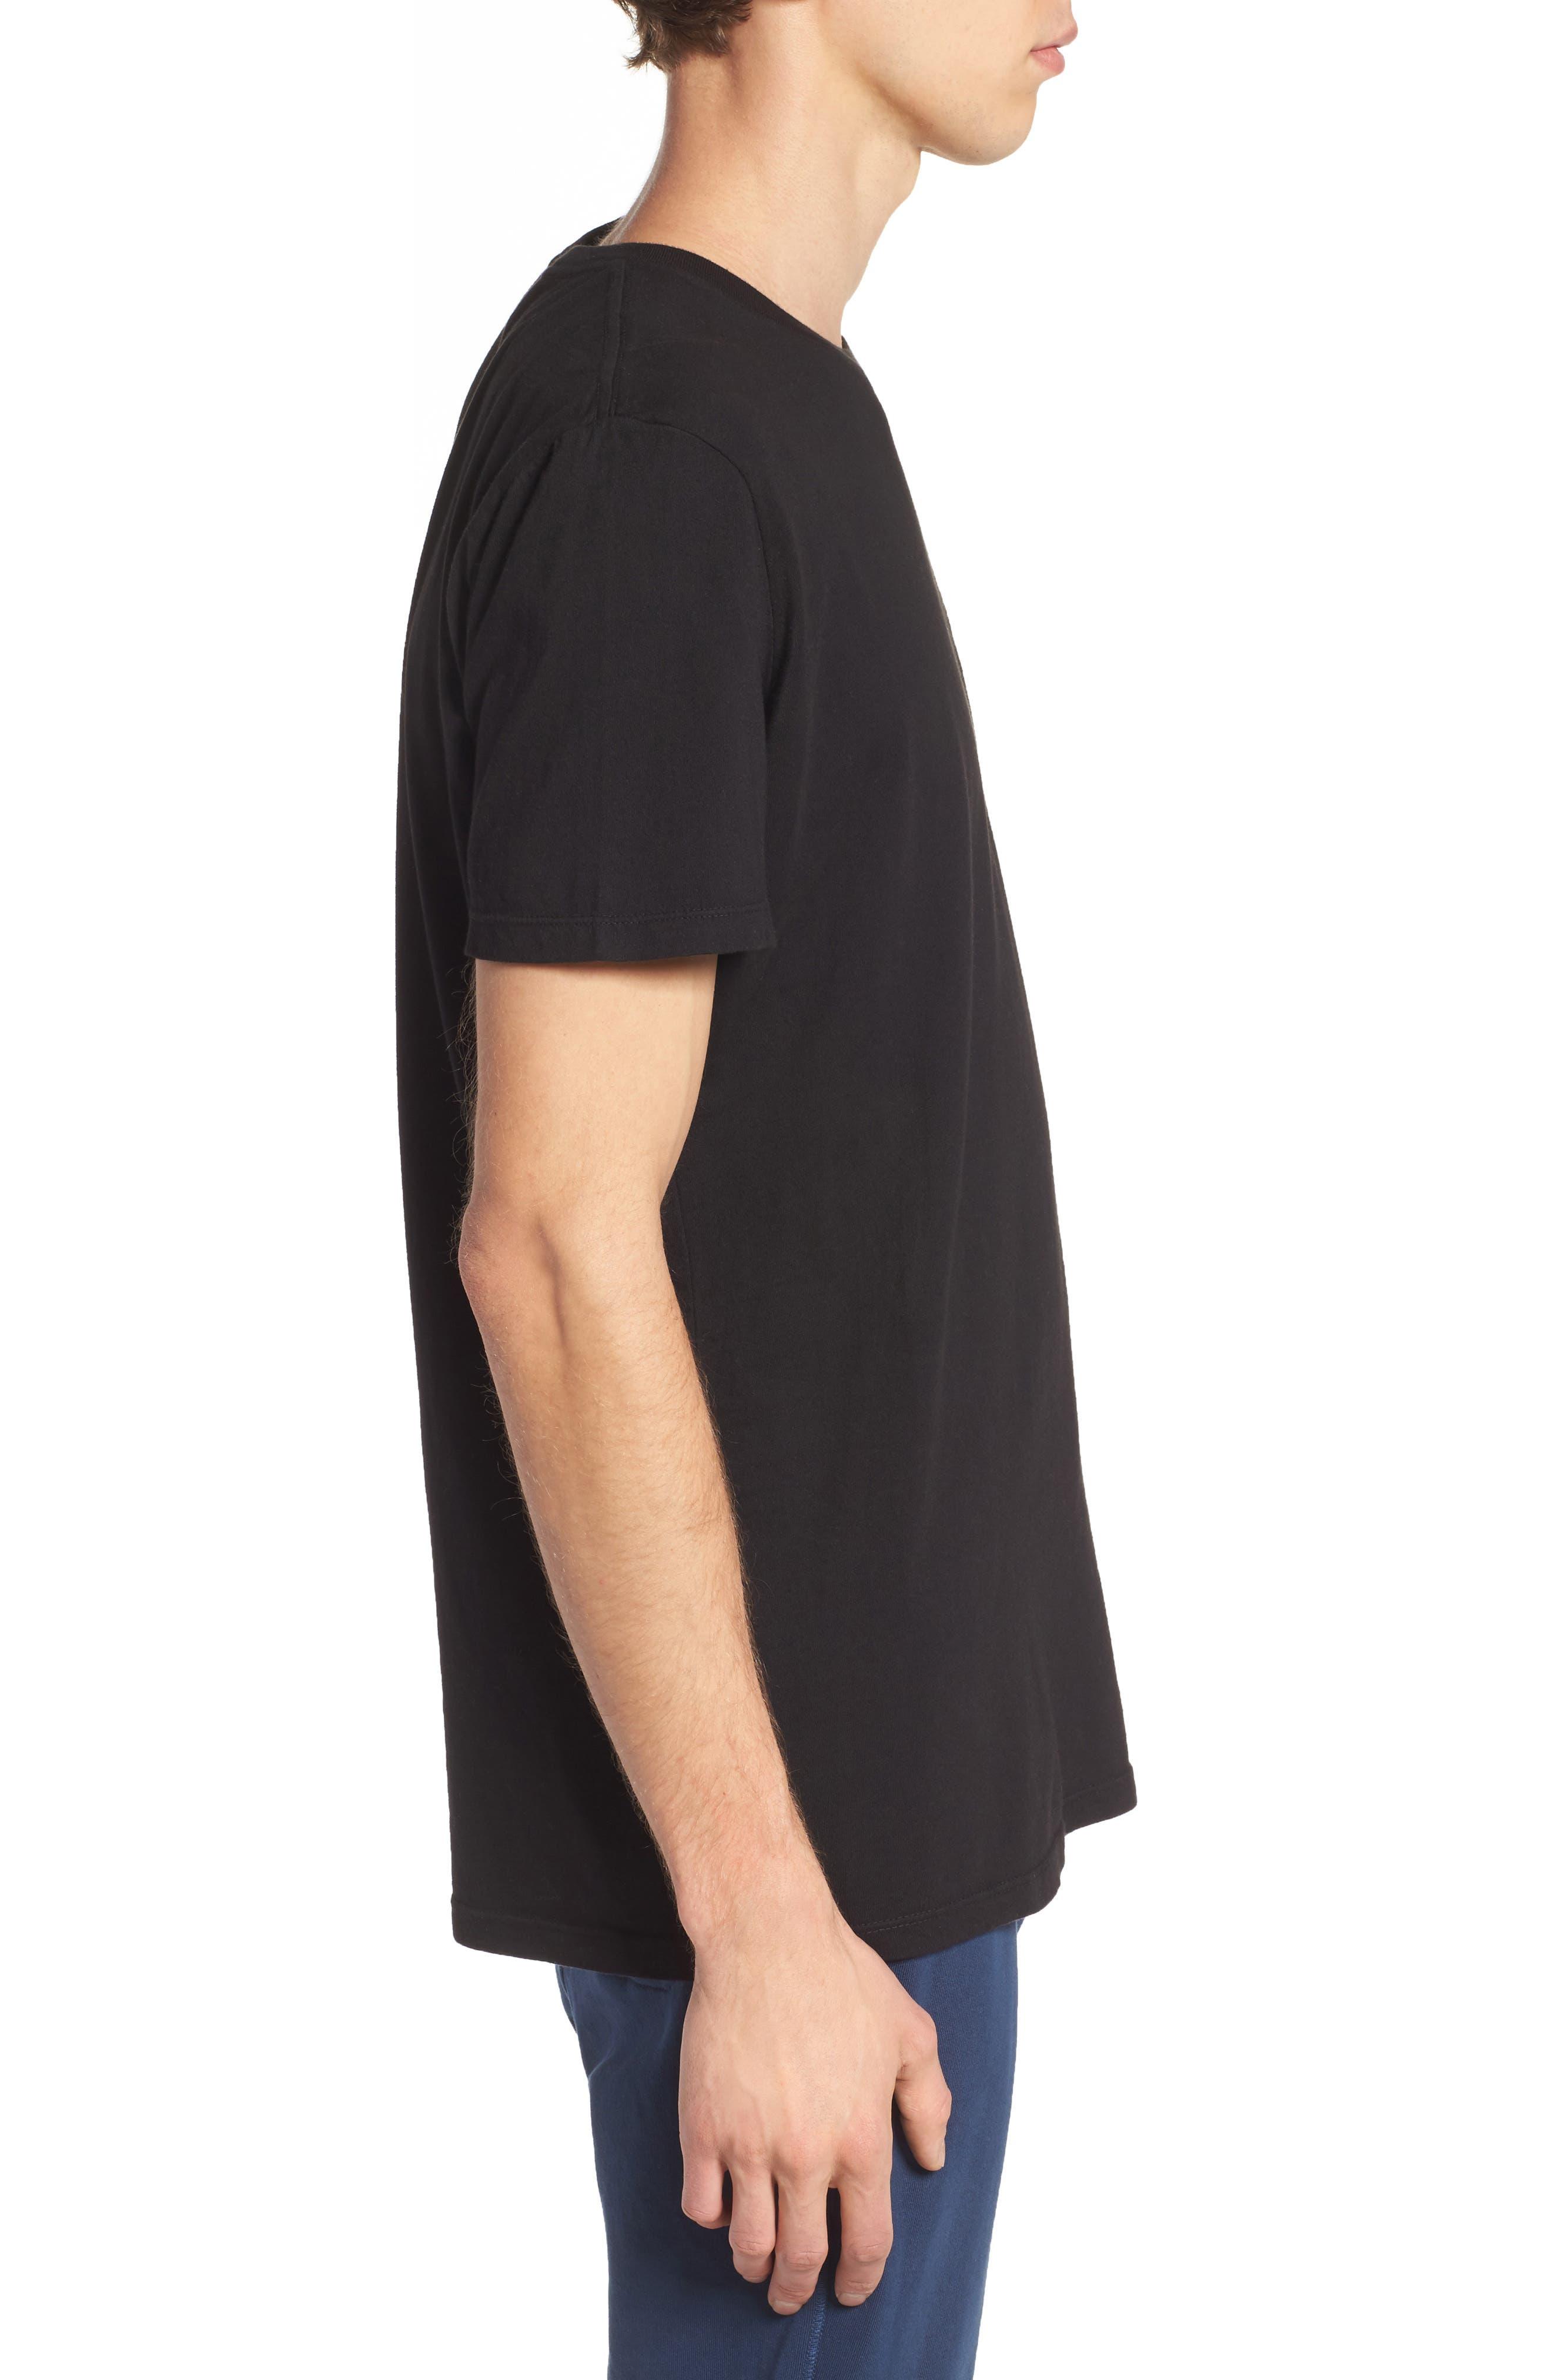 RICHER POORER, Lounge Pocket T-Shirt, Alternate thumbnail 3, color, BLACK